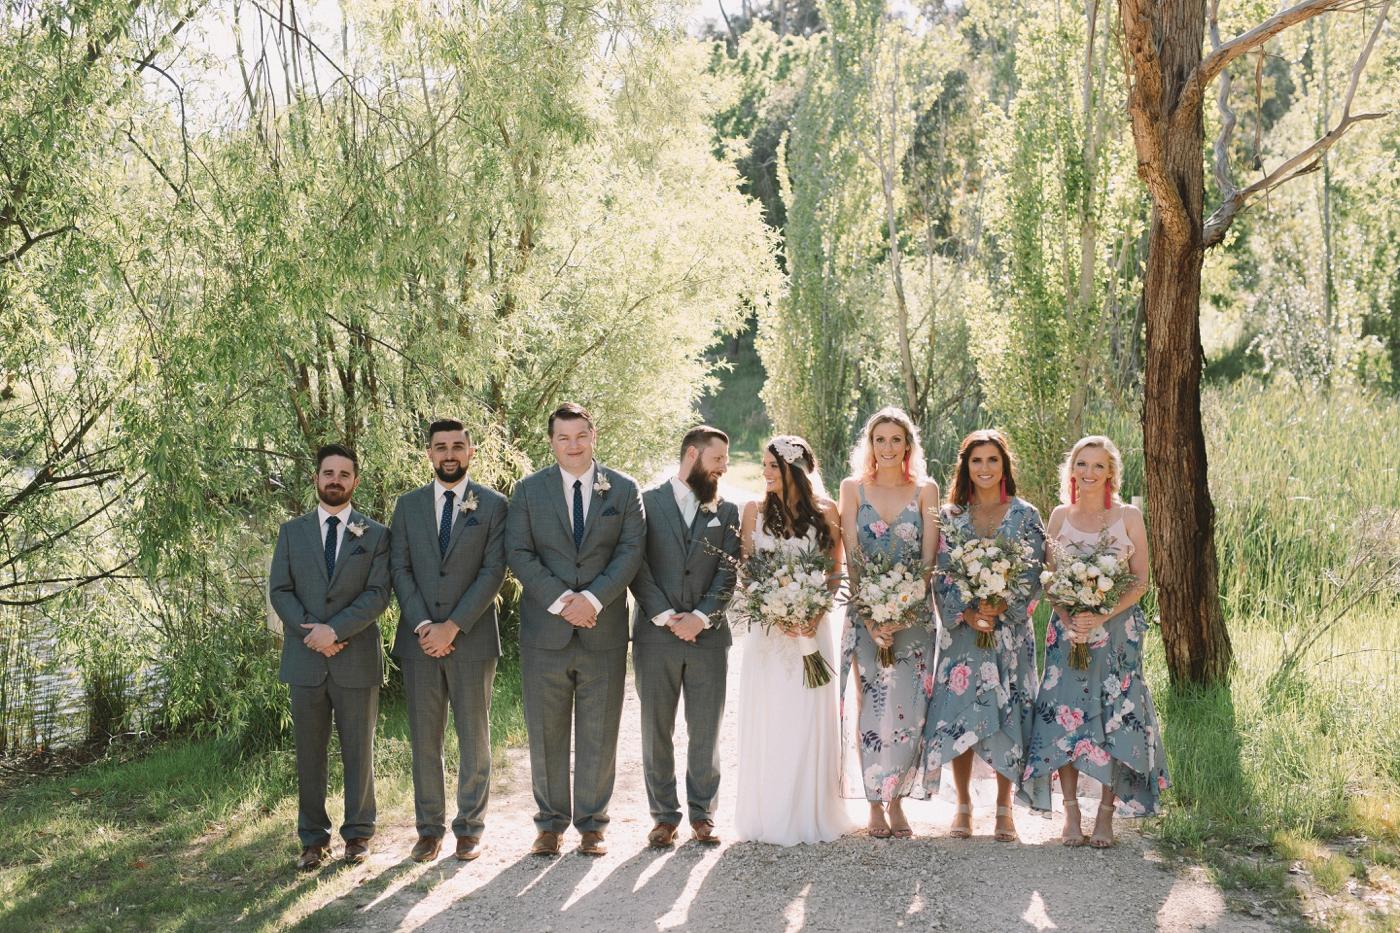 Maddy & Wes - K1 by Geoff Hardy Wedding - Adelaide Wedding Photographer - Natural wedding photography in Adelaide - Katherine Schultz_0038.jpg